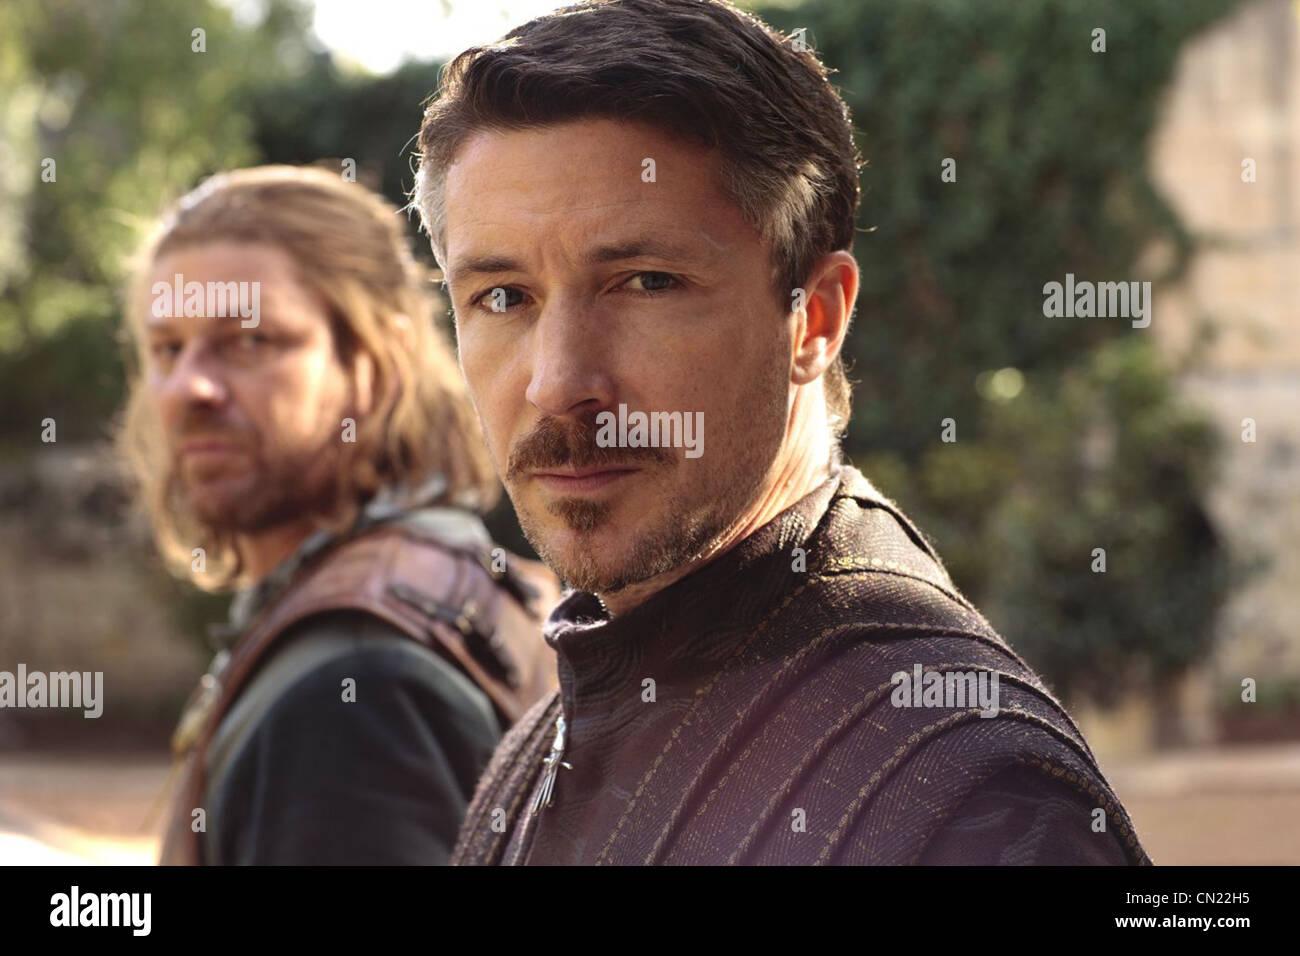 GAME OF THRONES (TV) (2011) SEAN BEAN, AIDAN GILLEN, 007 MOVIESTORE COLLECTION LTD - Stock Image